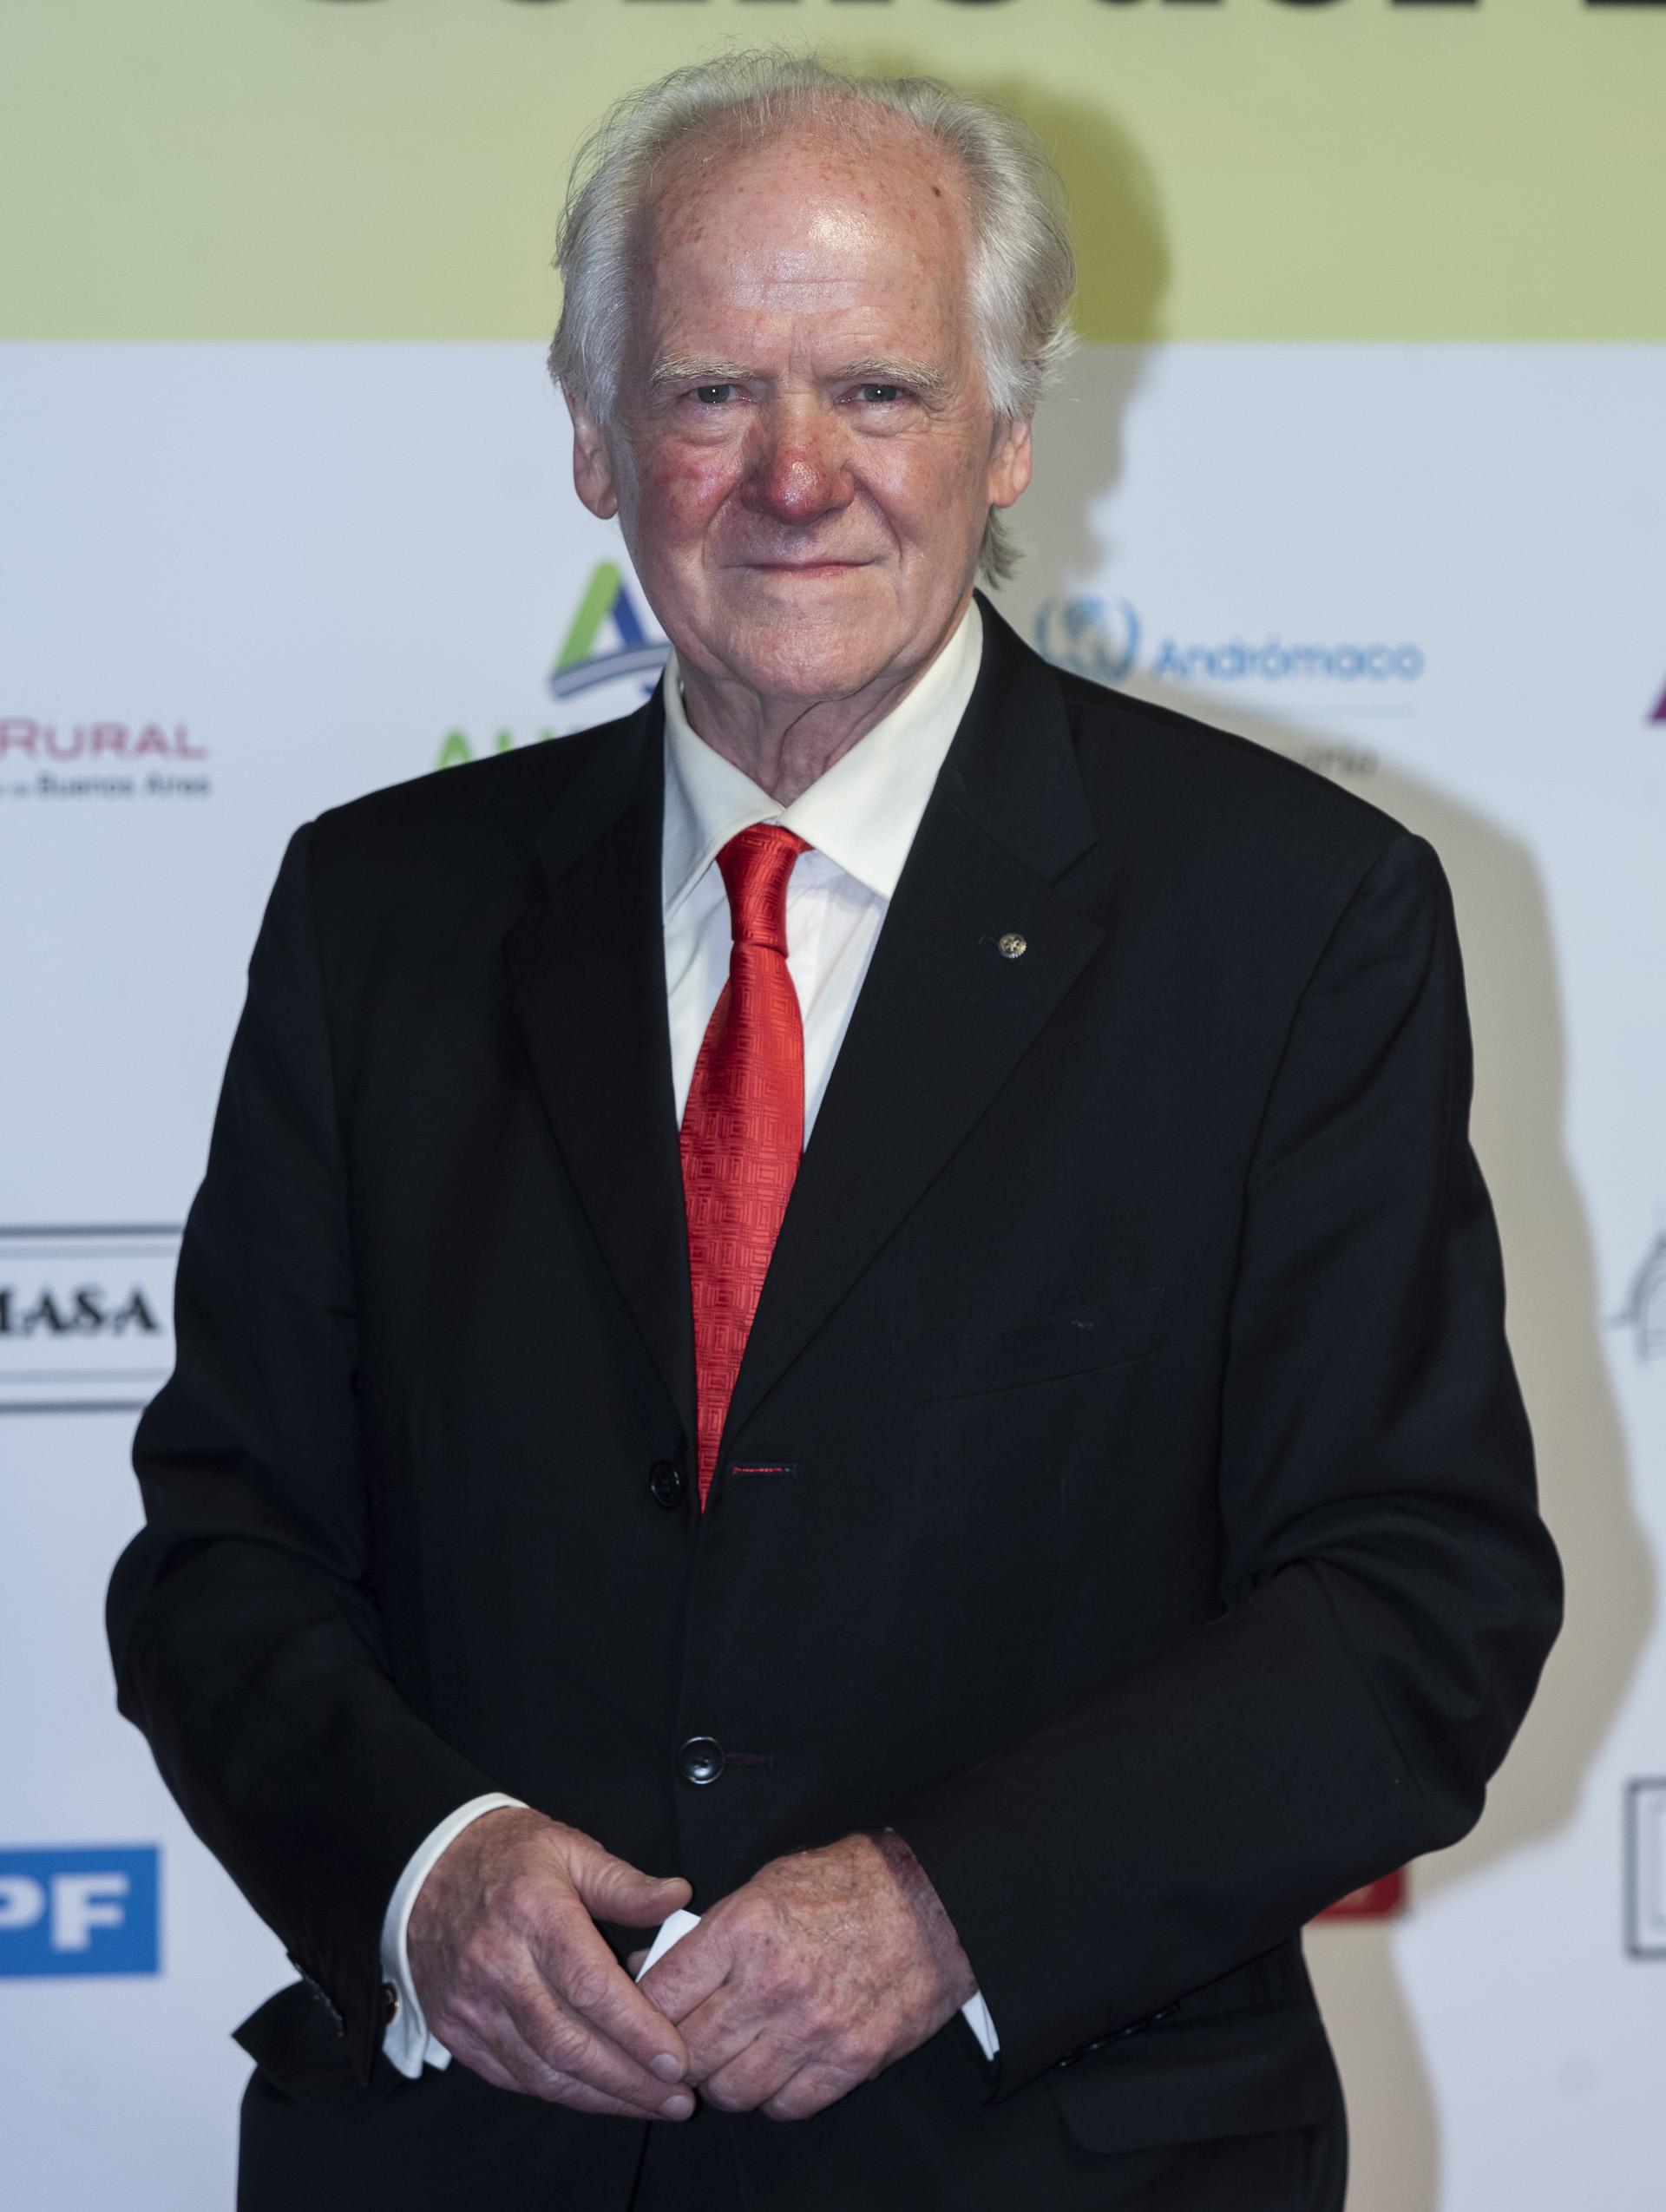 Juan Carlos Blumberg, titular de la Fundación Axel Blumberg